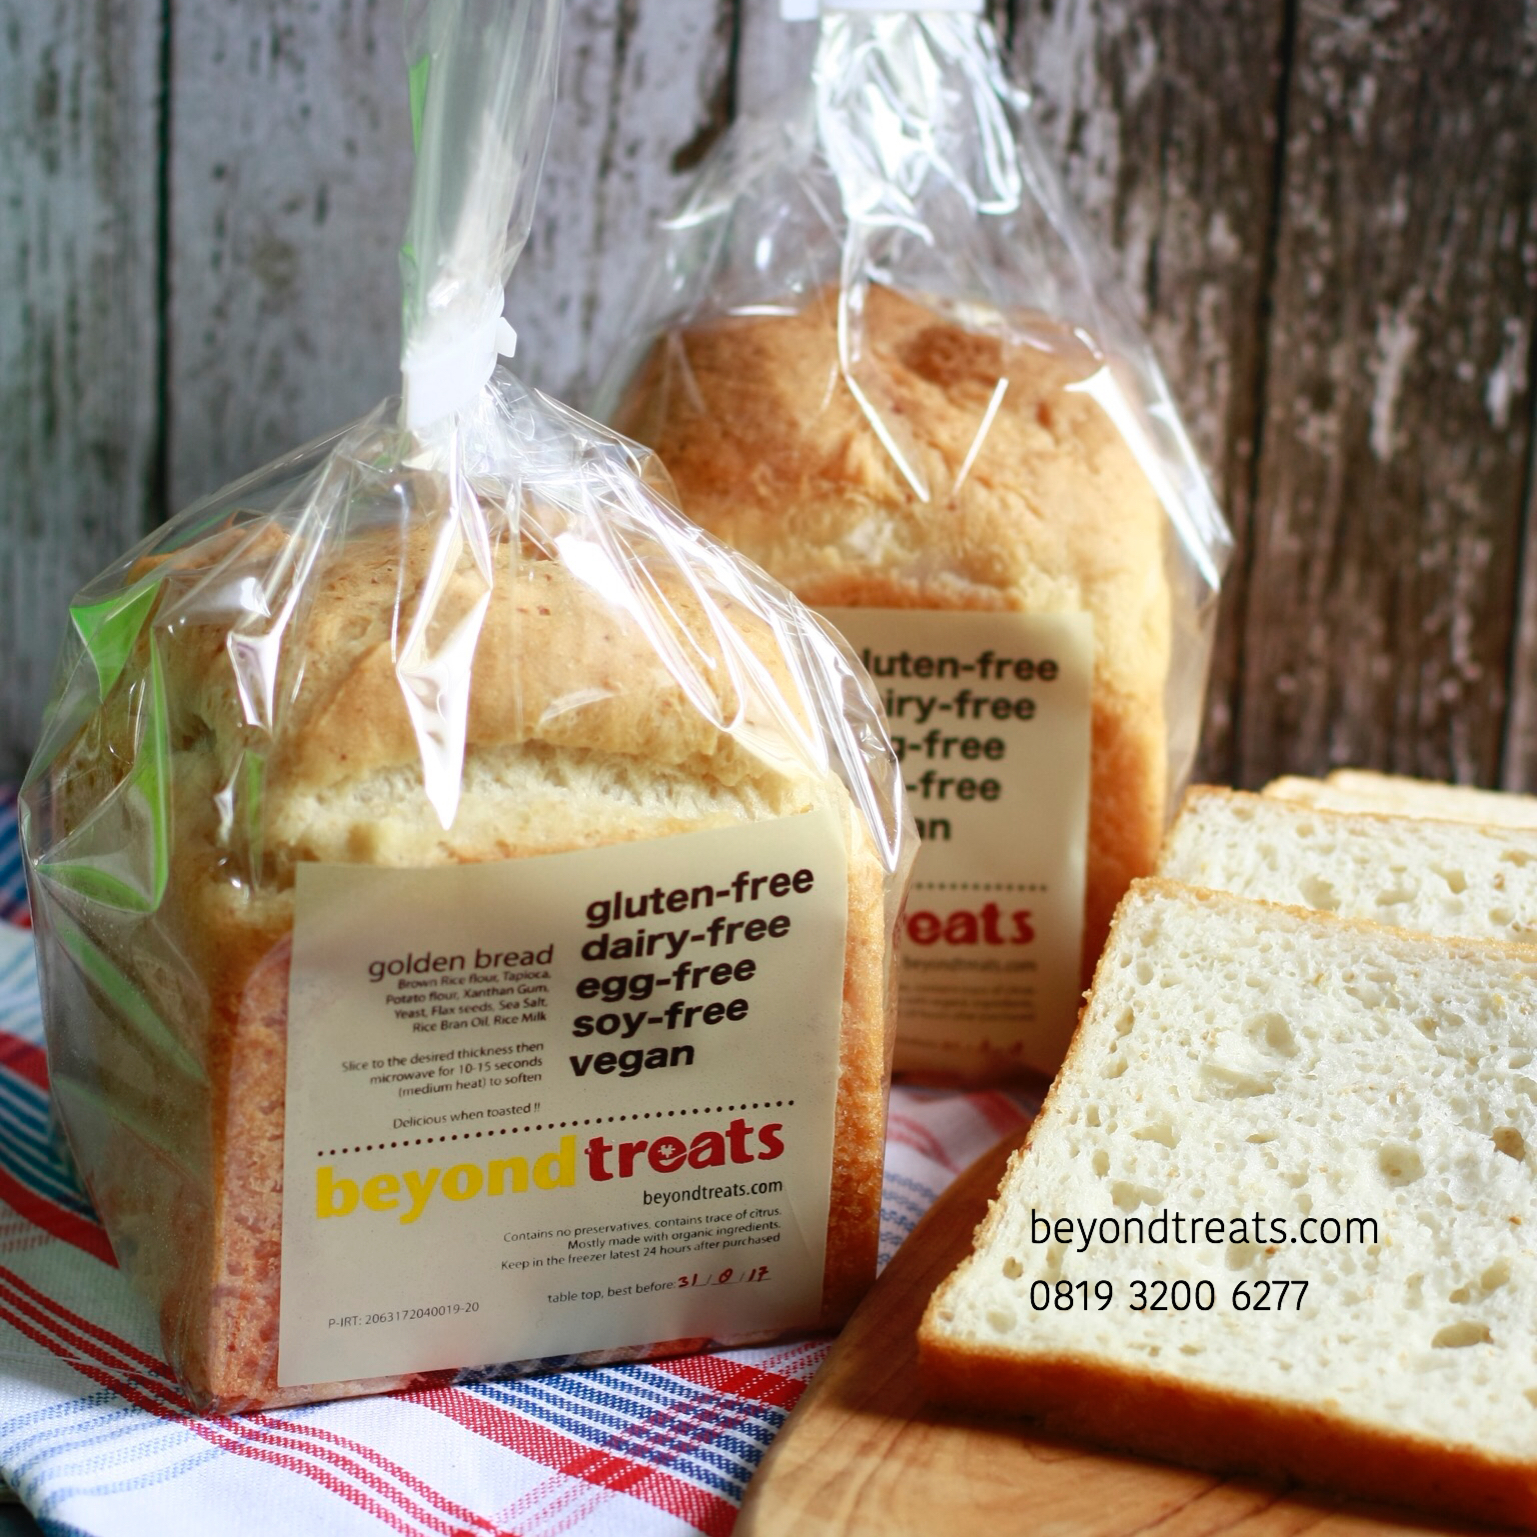 Jual Golden Bread Roti Tawar Gluten Free Vegan Gfcfef Gfcf Beyond Gandum 400 Gr Treats Tokopedia